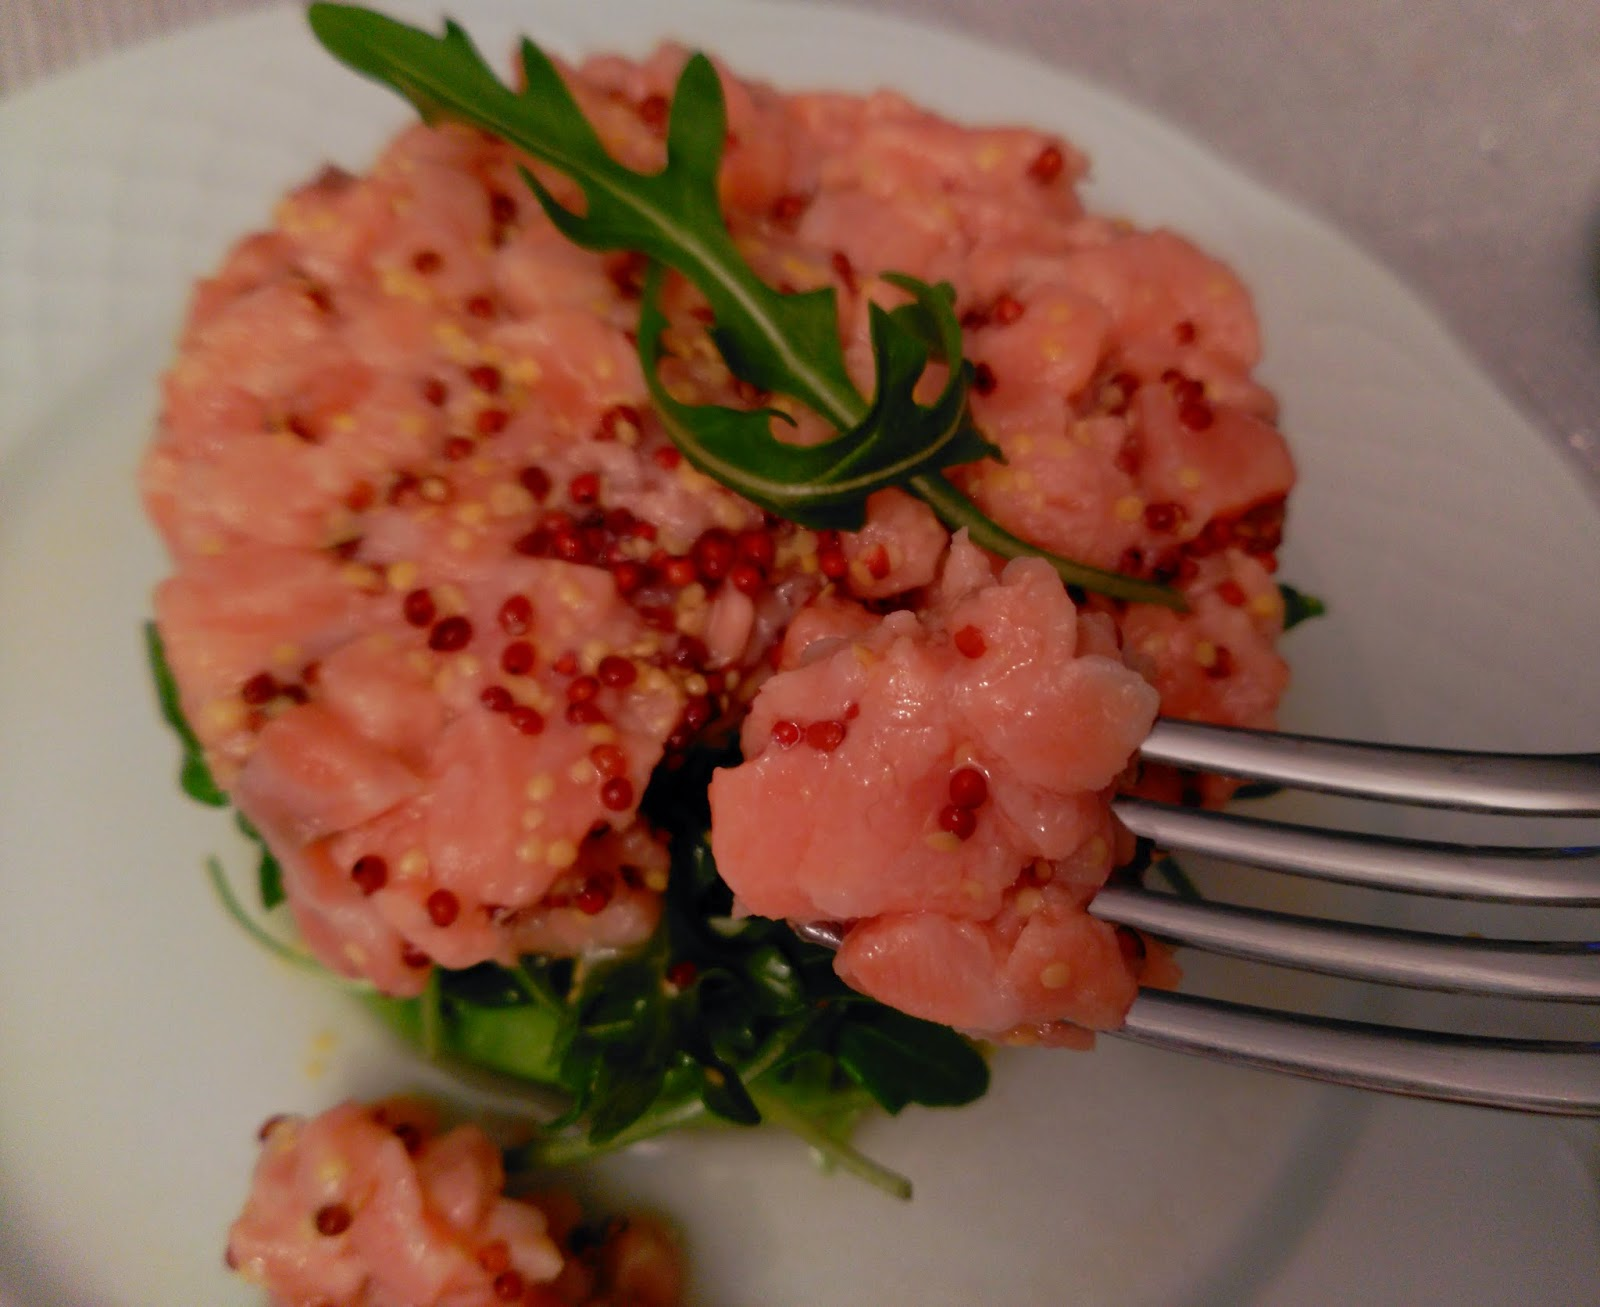 http://acocinate.blogspot.com.es/2015/02/tartar-de-salmon.html